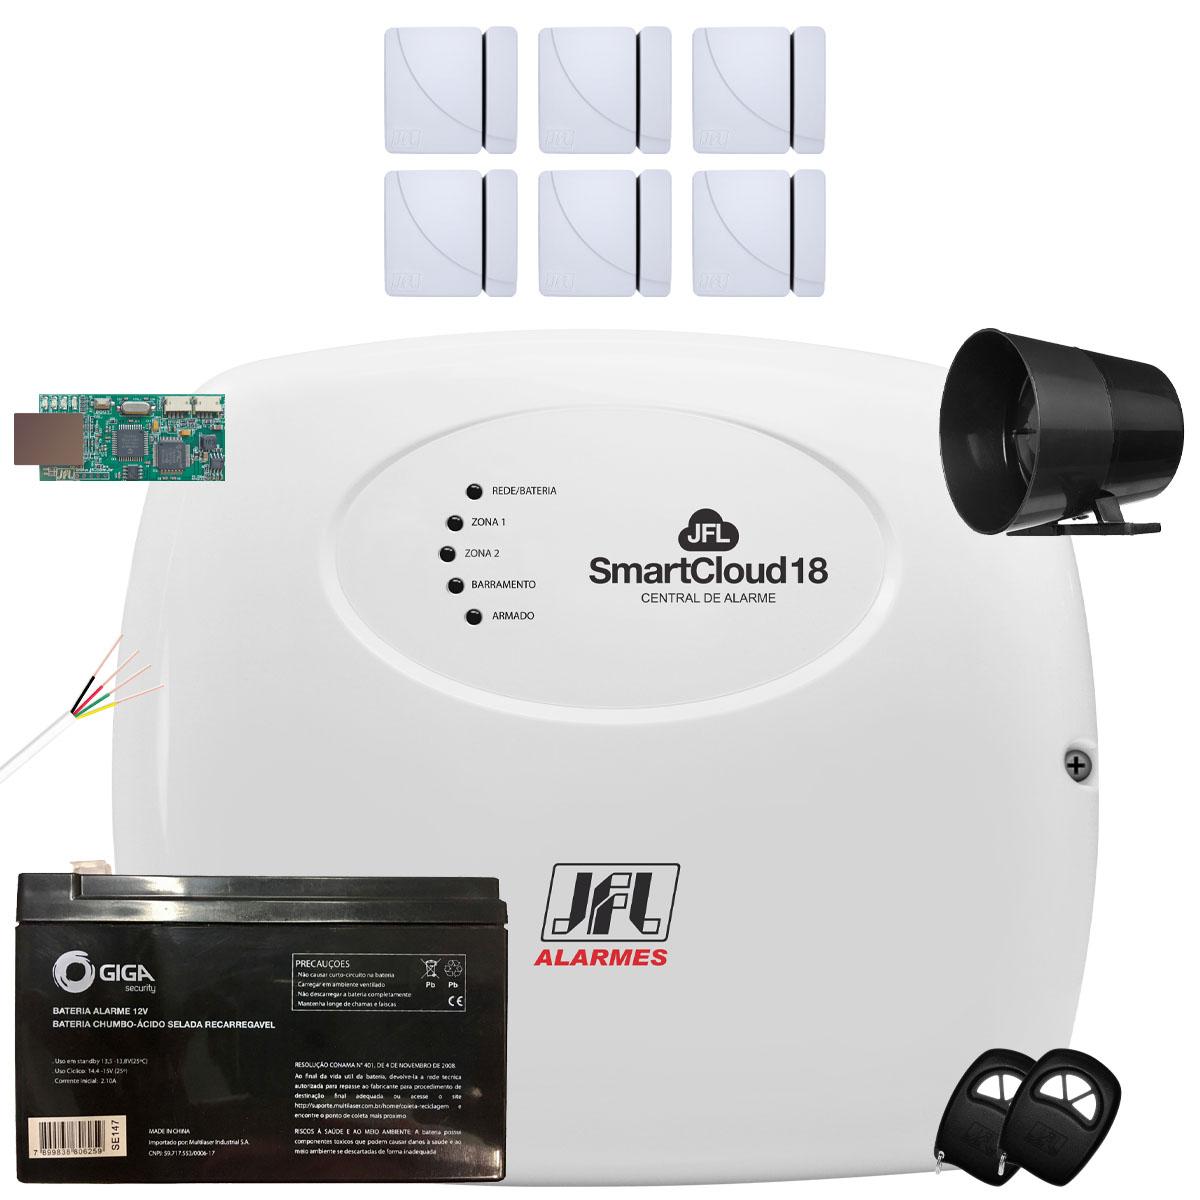 Kit Alarme Residencial SmartCloud 18 Jfl Sensor Sem Fio Shc Fit